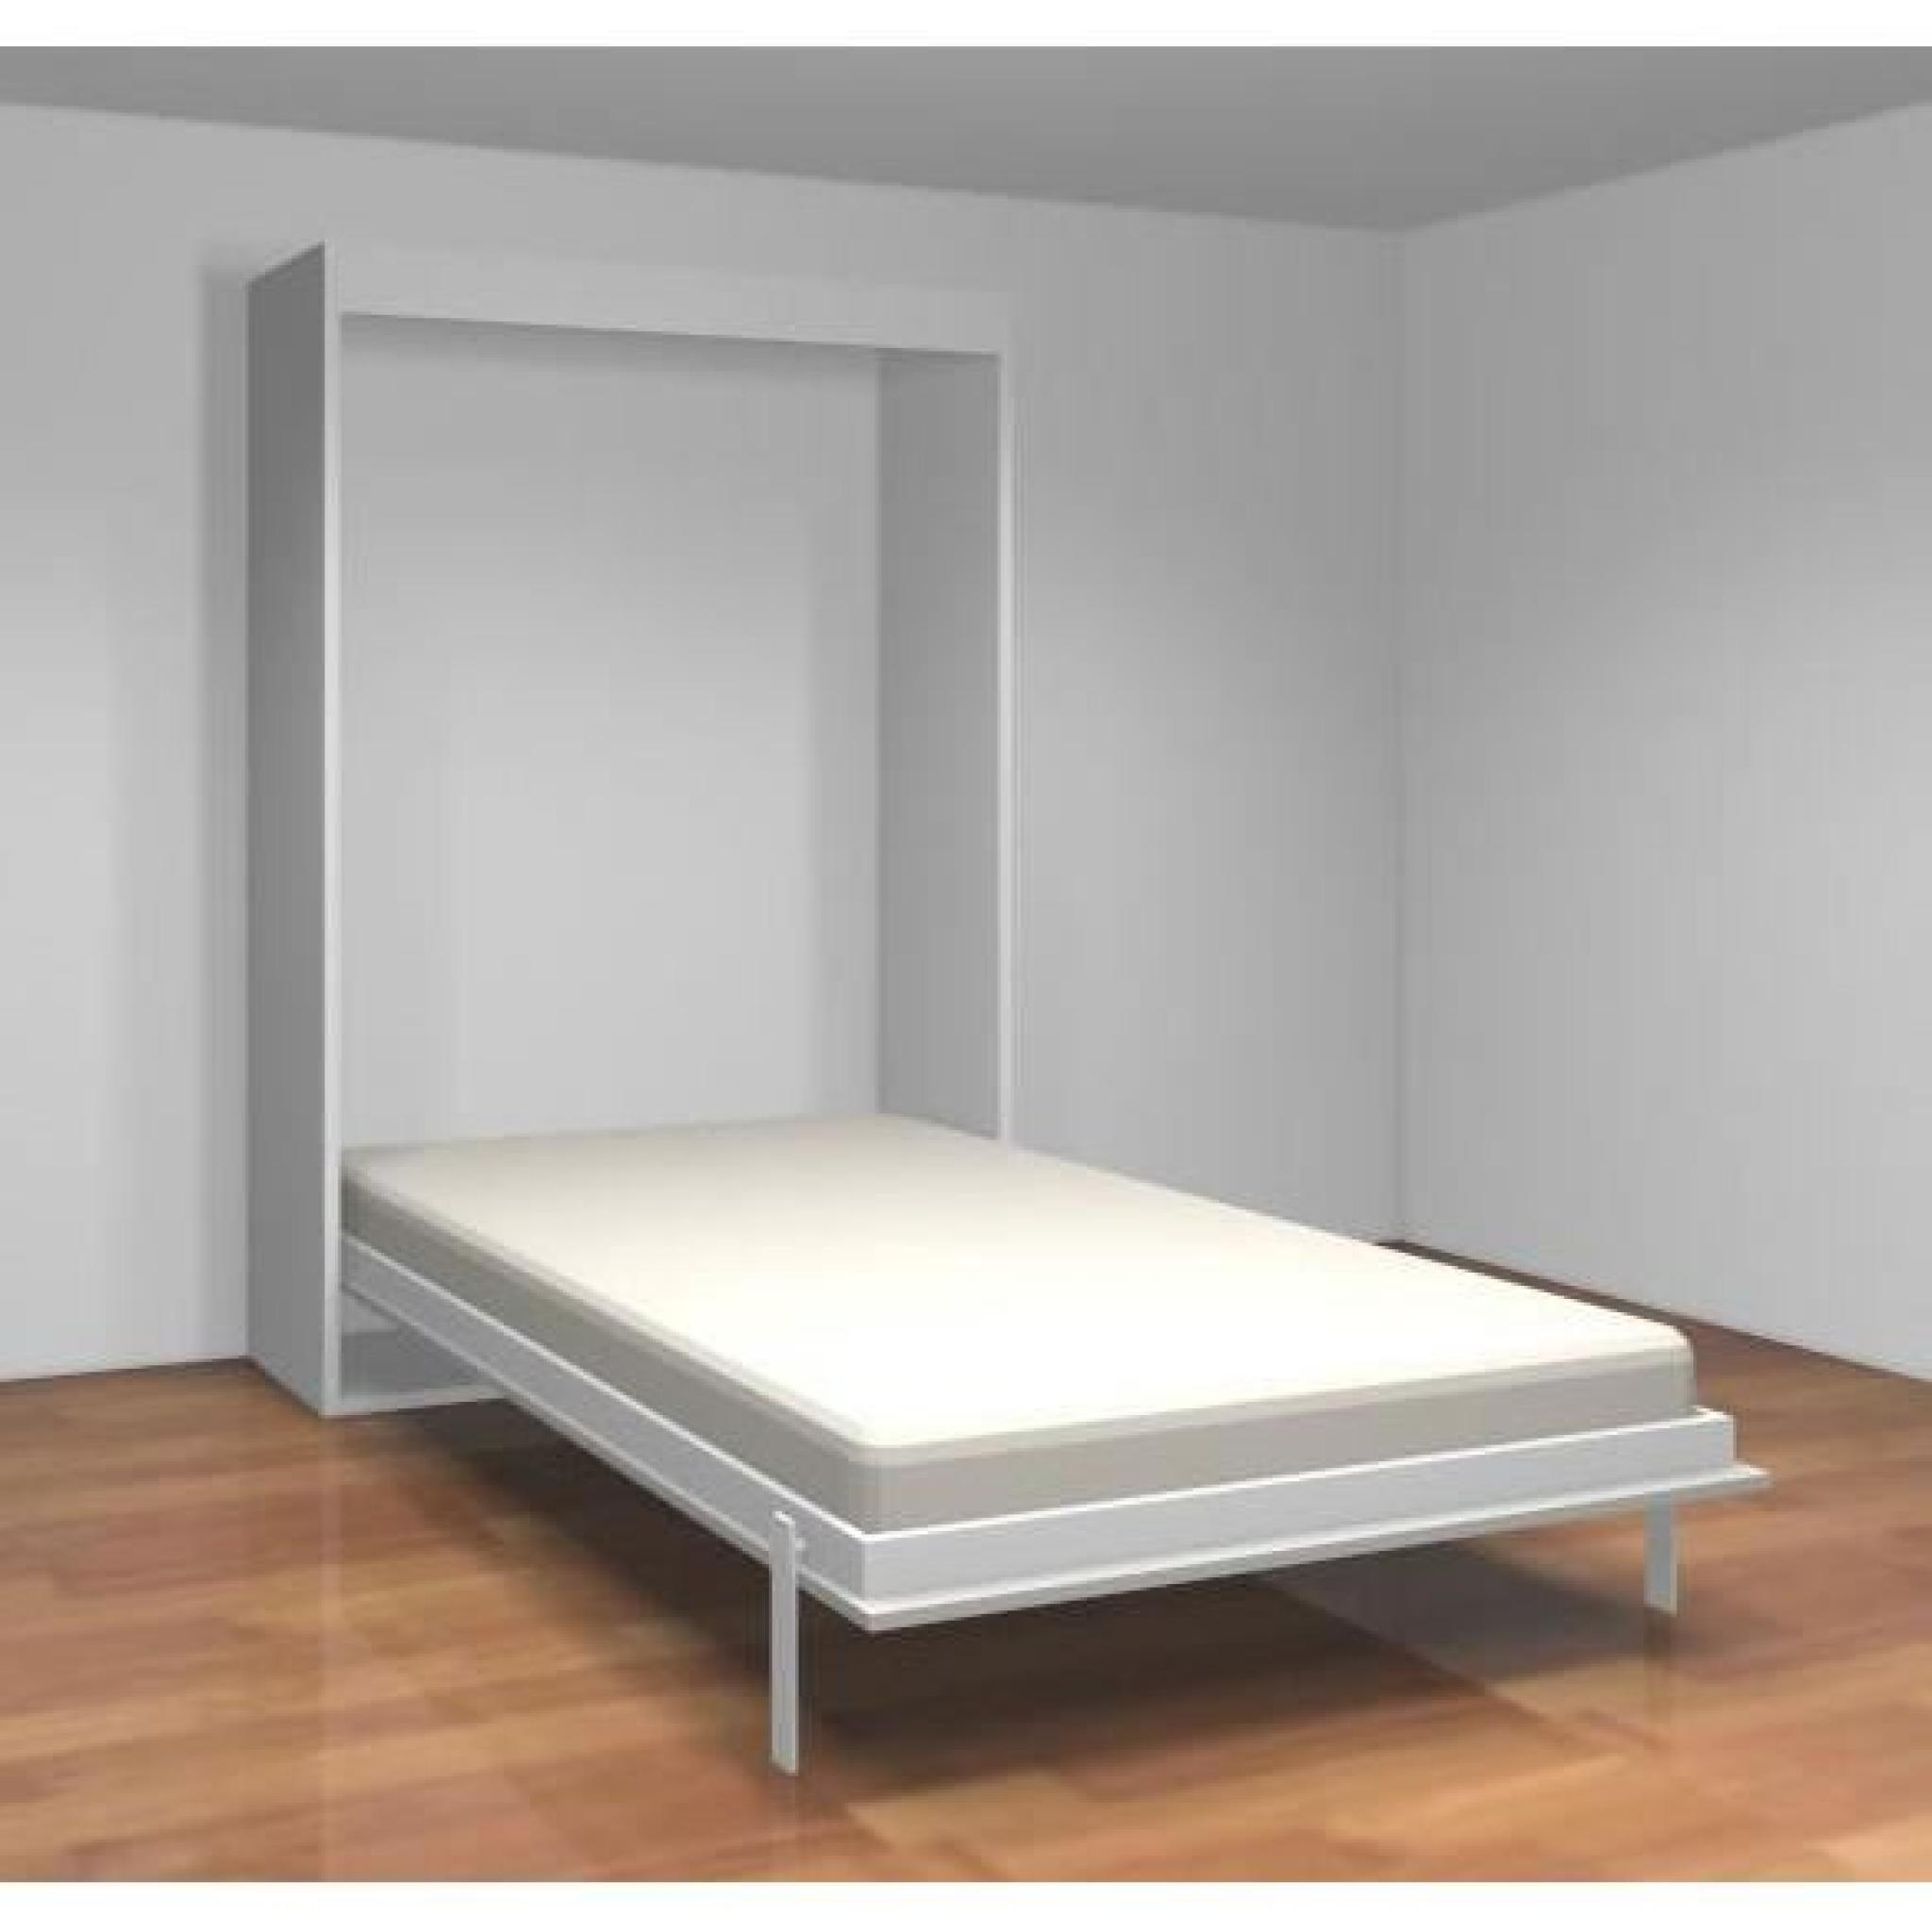 Armoire Lit Escamotable Pas Cher   Bright Shadow Online pour Lit Escamotable Plafond Pas Cher